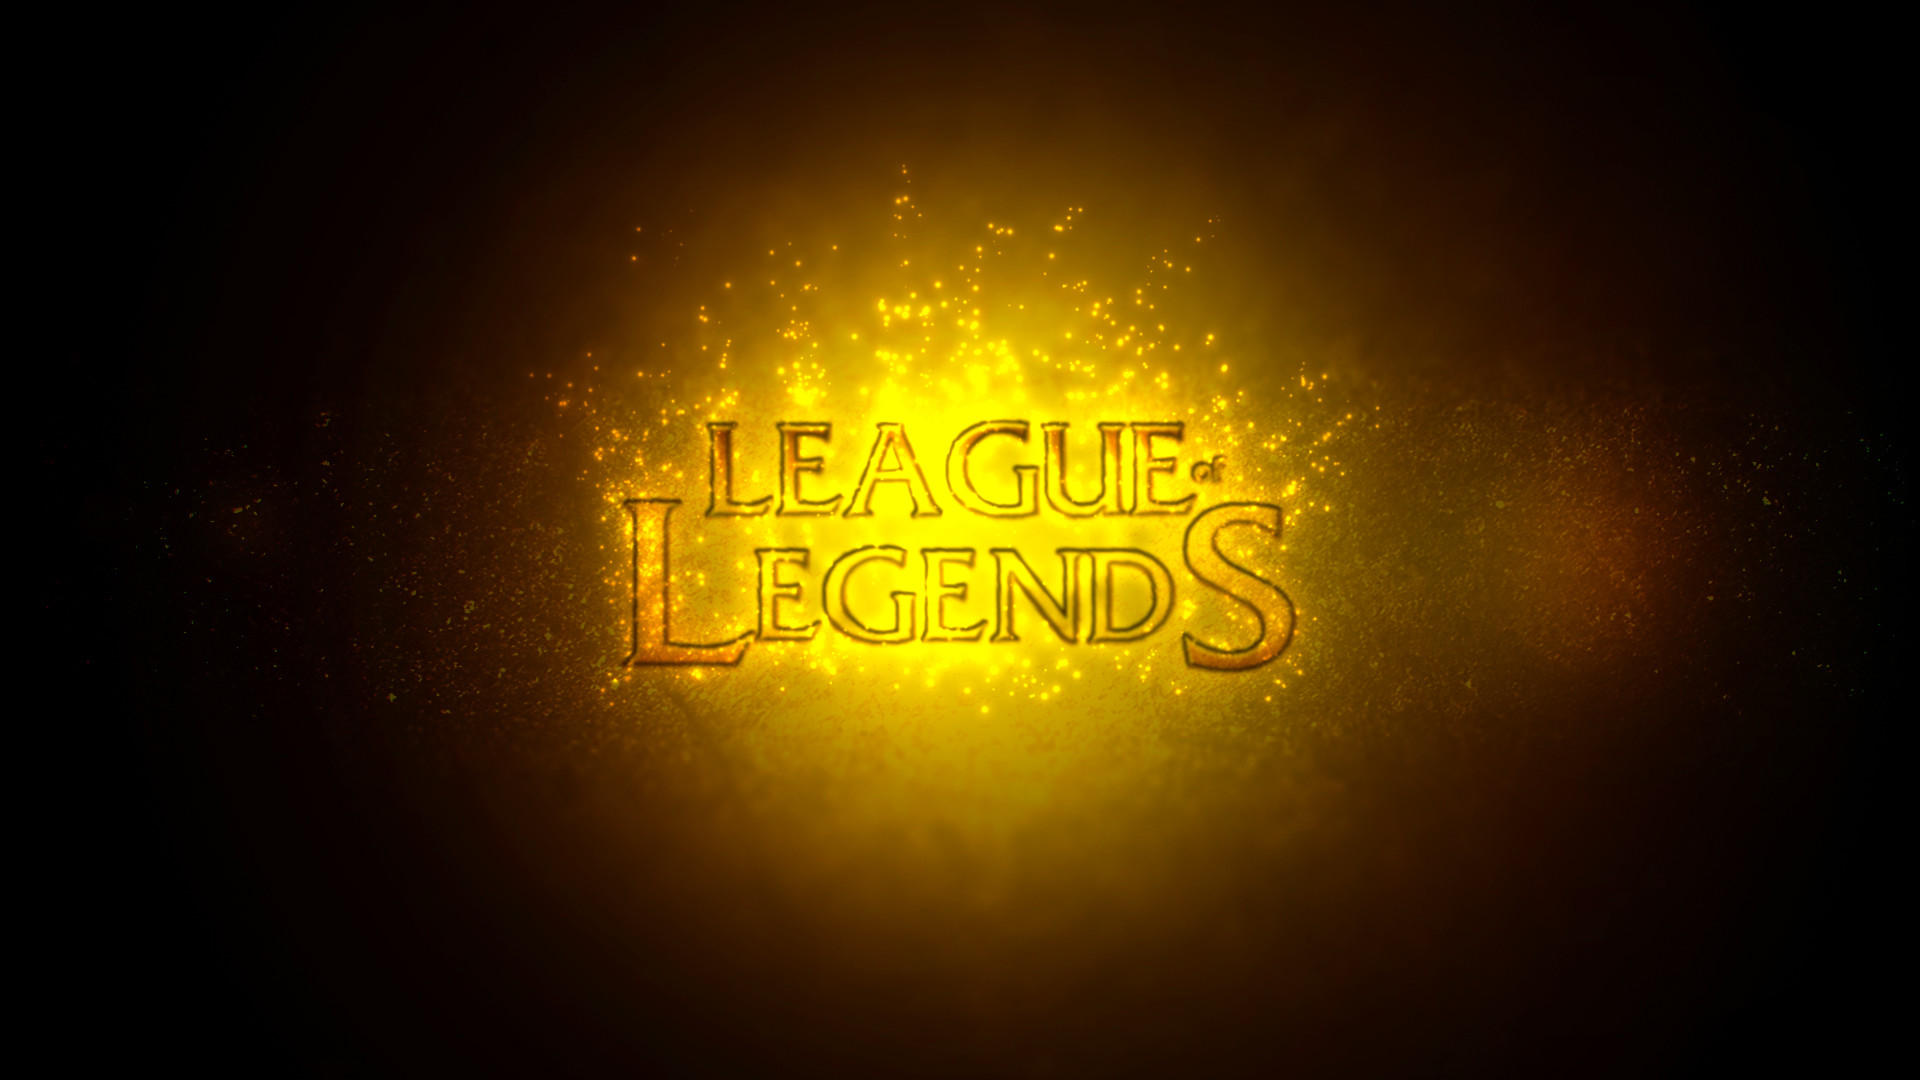 … League of Legends Logo – HD Wallpaper by ThePeakEater